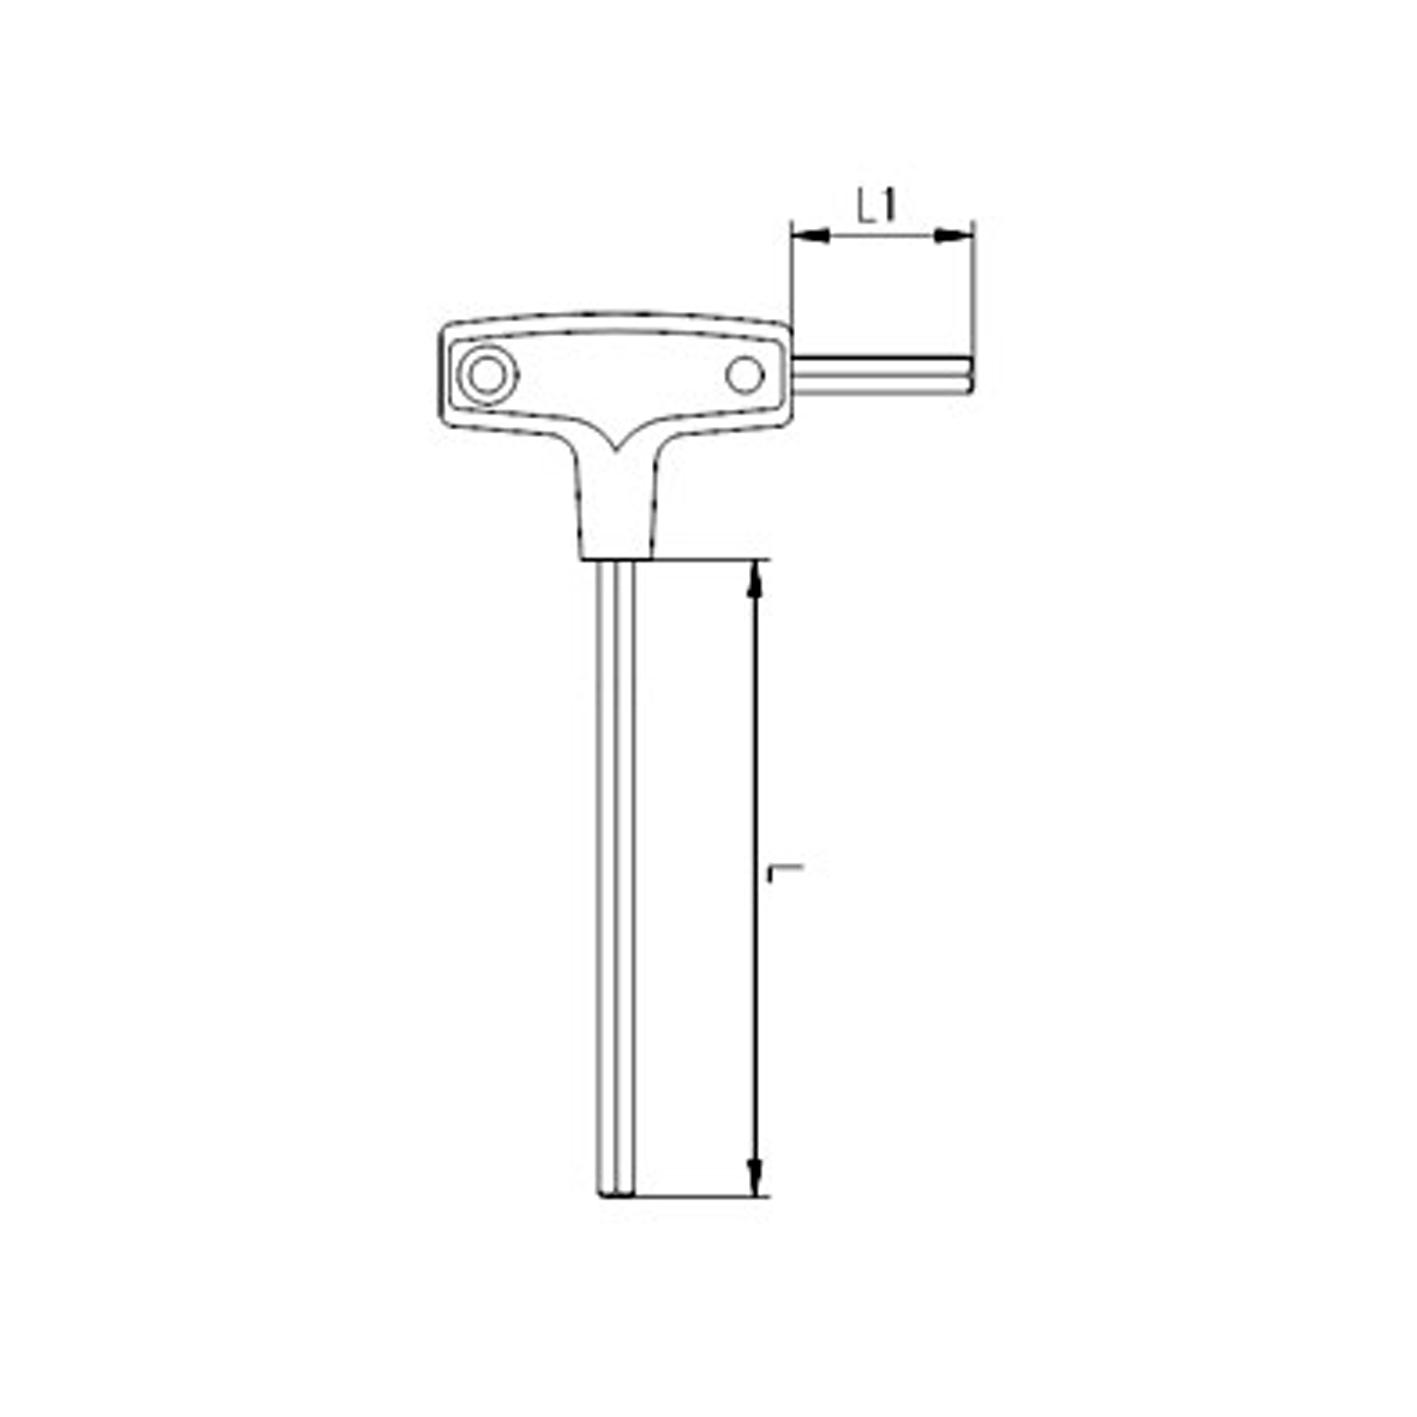 İzeltaş 4mm T Tipi Allen Anahtar